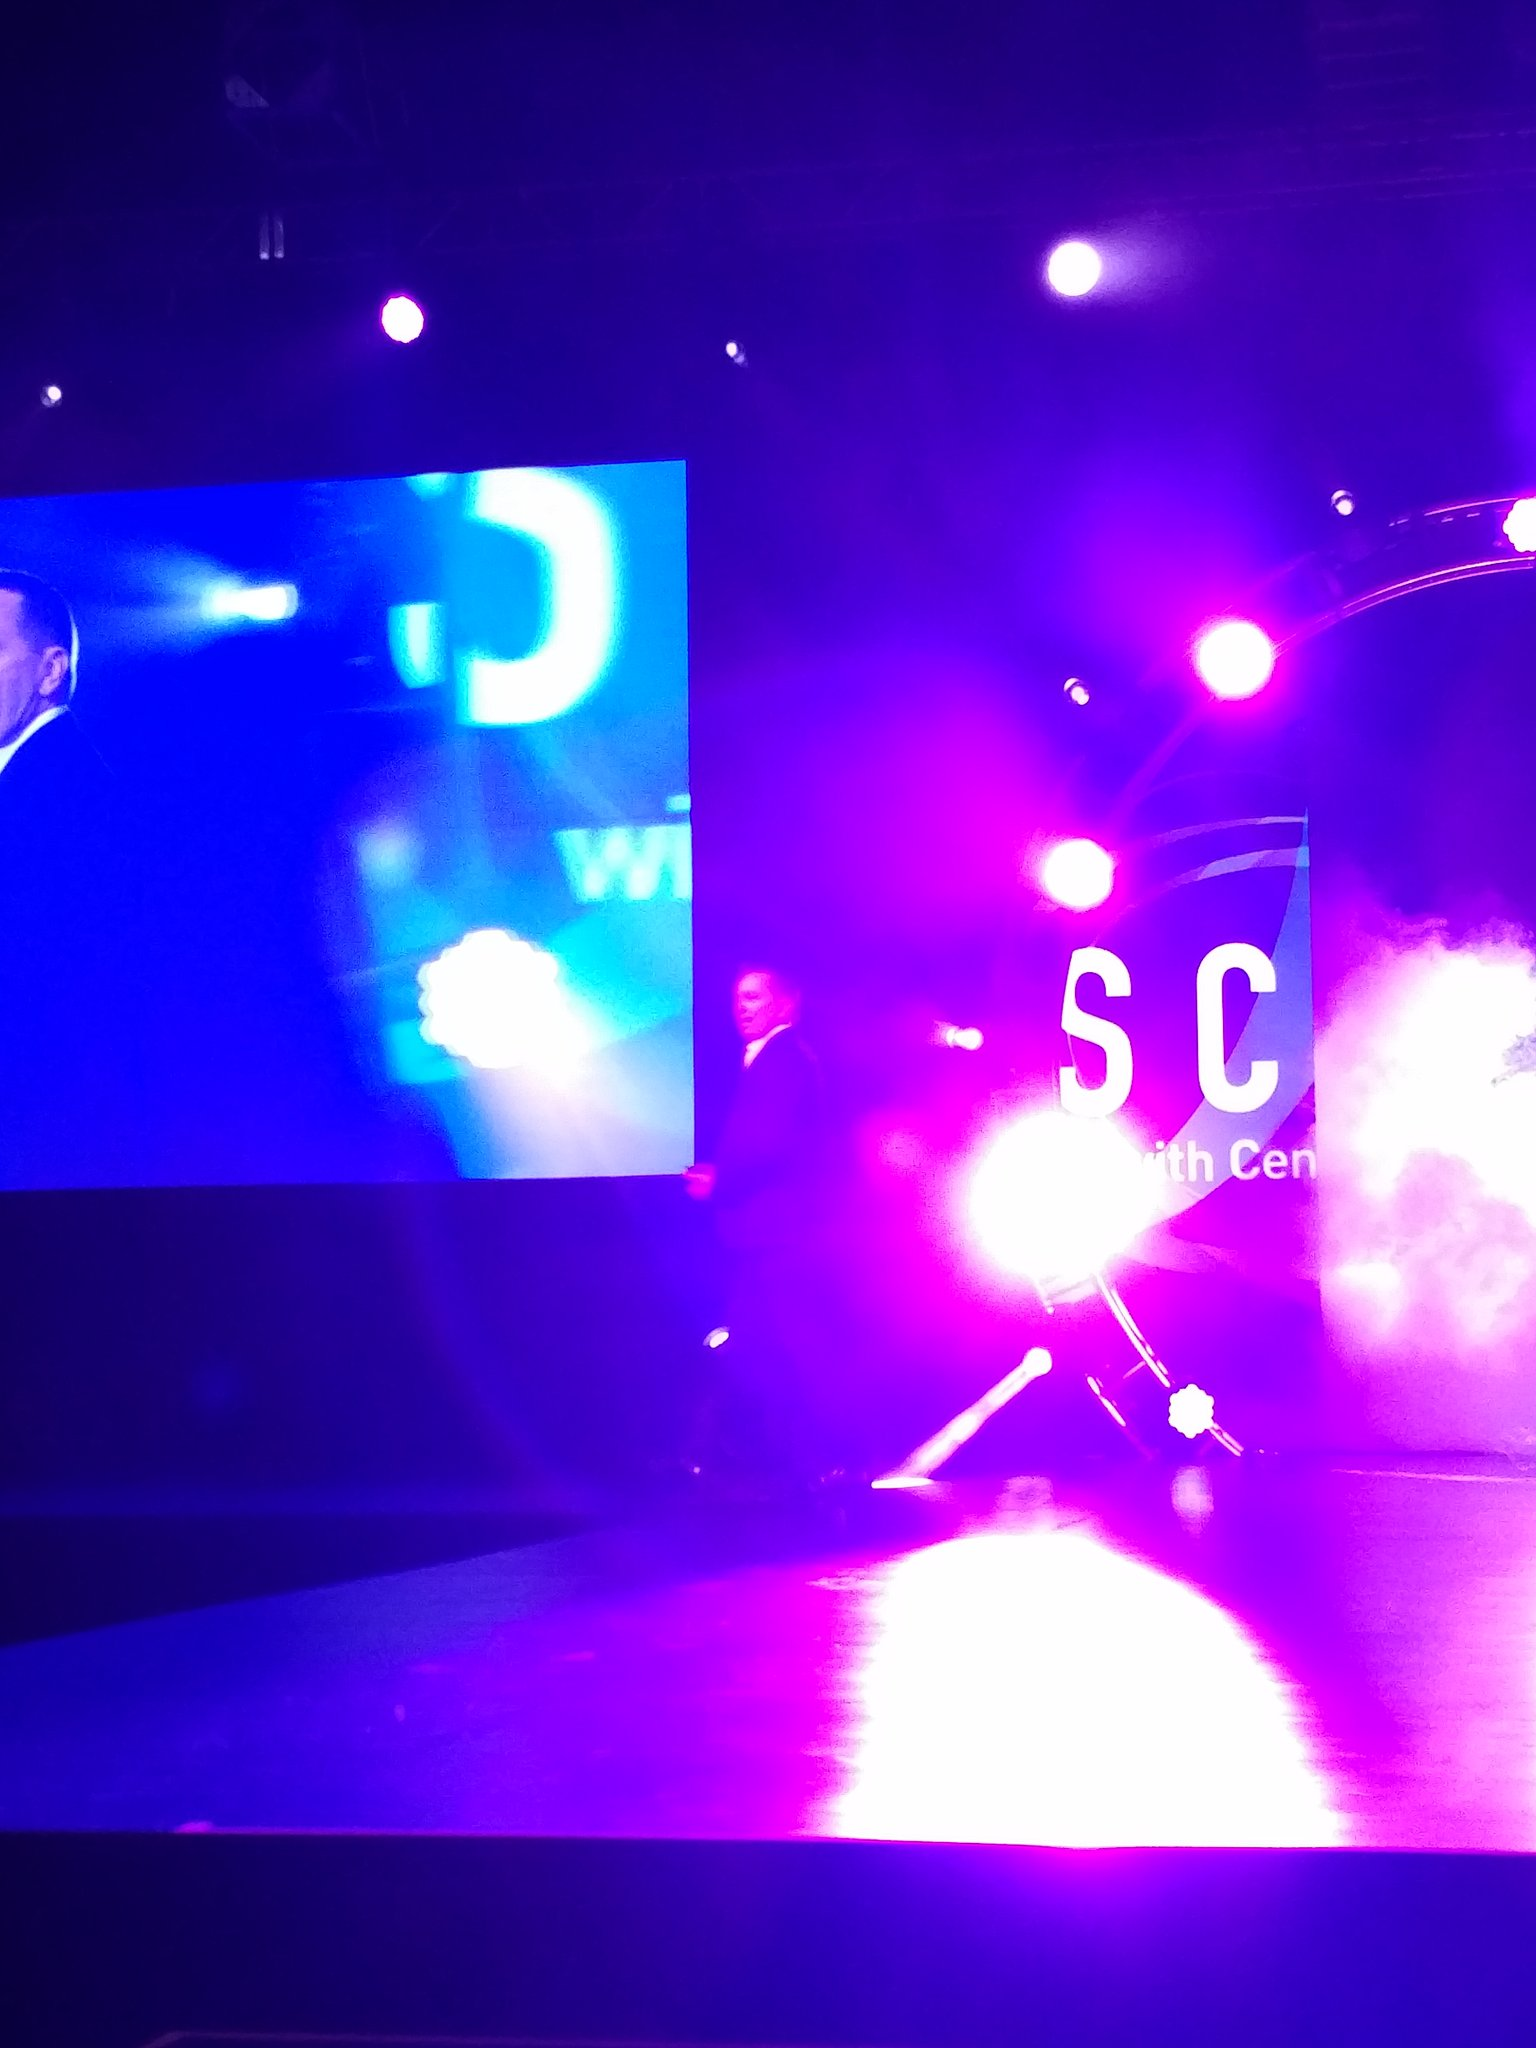 And a Rockstar entrance for Corbin, @CenturyLink Alliances leader, opens #CenturyLinkAscend https://t.co/DOvMeAQRce